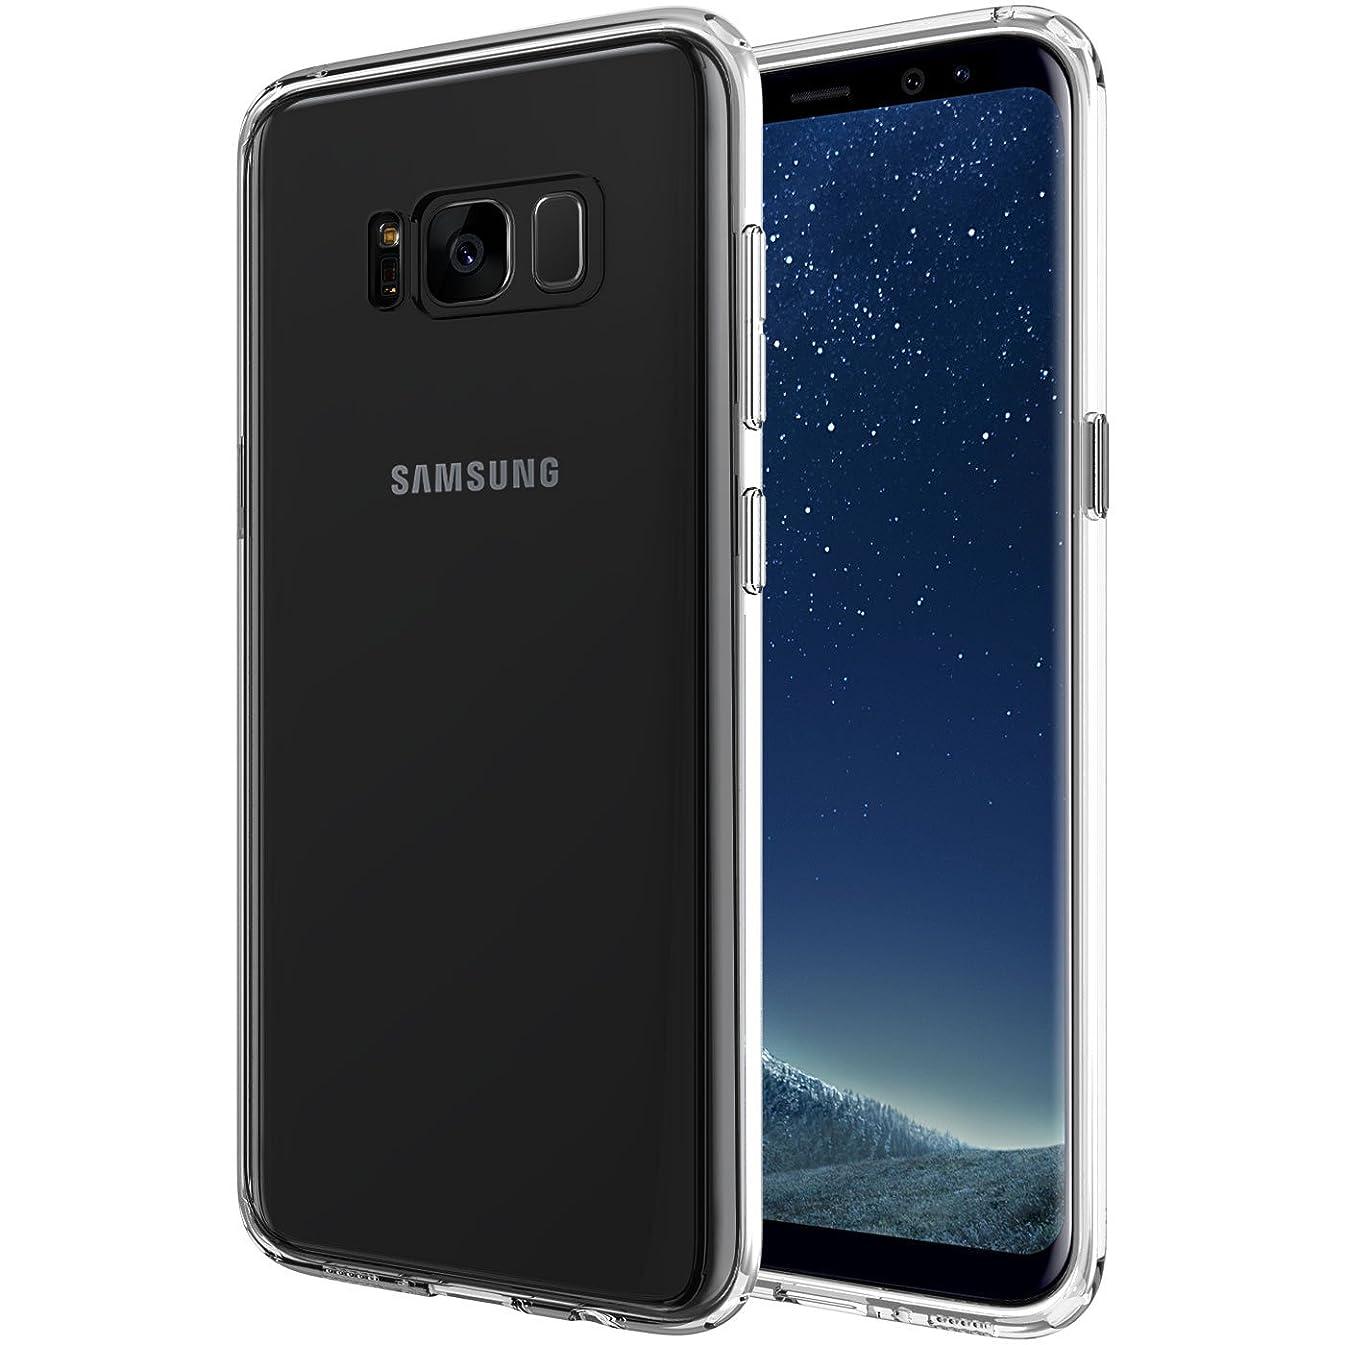 Samsung Galaxy S8 Case, ZUSLAB Slim Hybrid Crystal Clear PC Back TPU Bumper, Anti-Shock Protective Cover For Galaxy S8 (Clear)